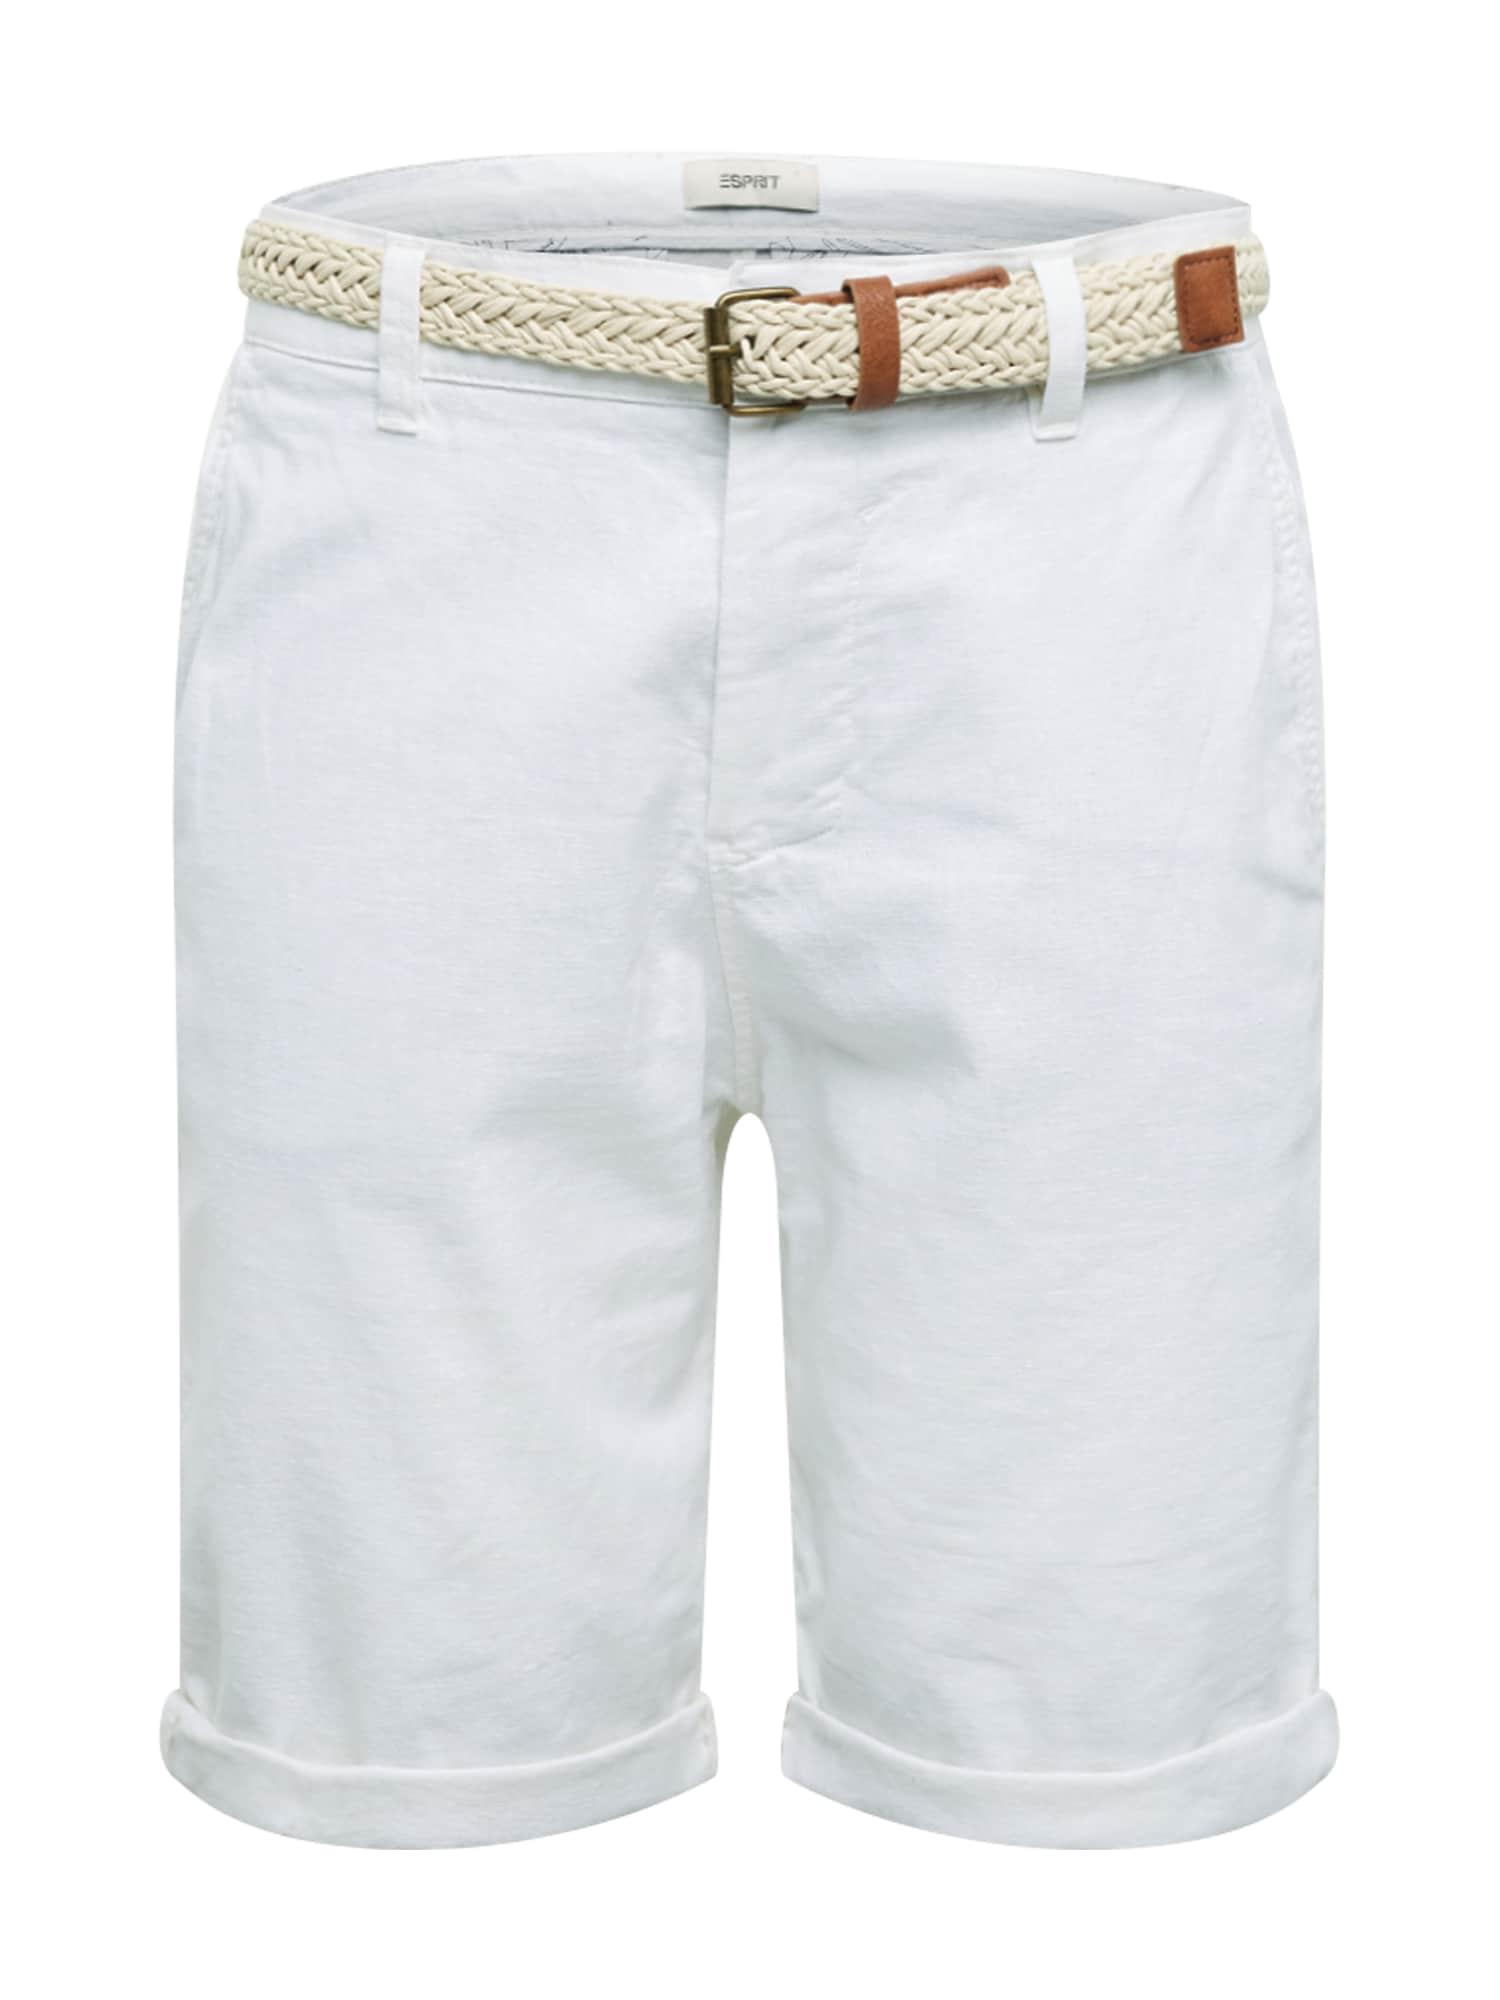 ESPRIT Chino stiliaus kelnės 'F BASIC CO/LI' balta